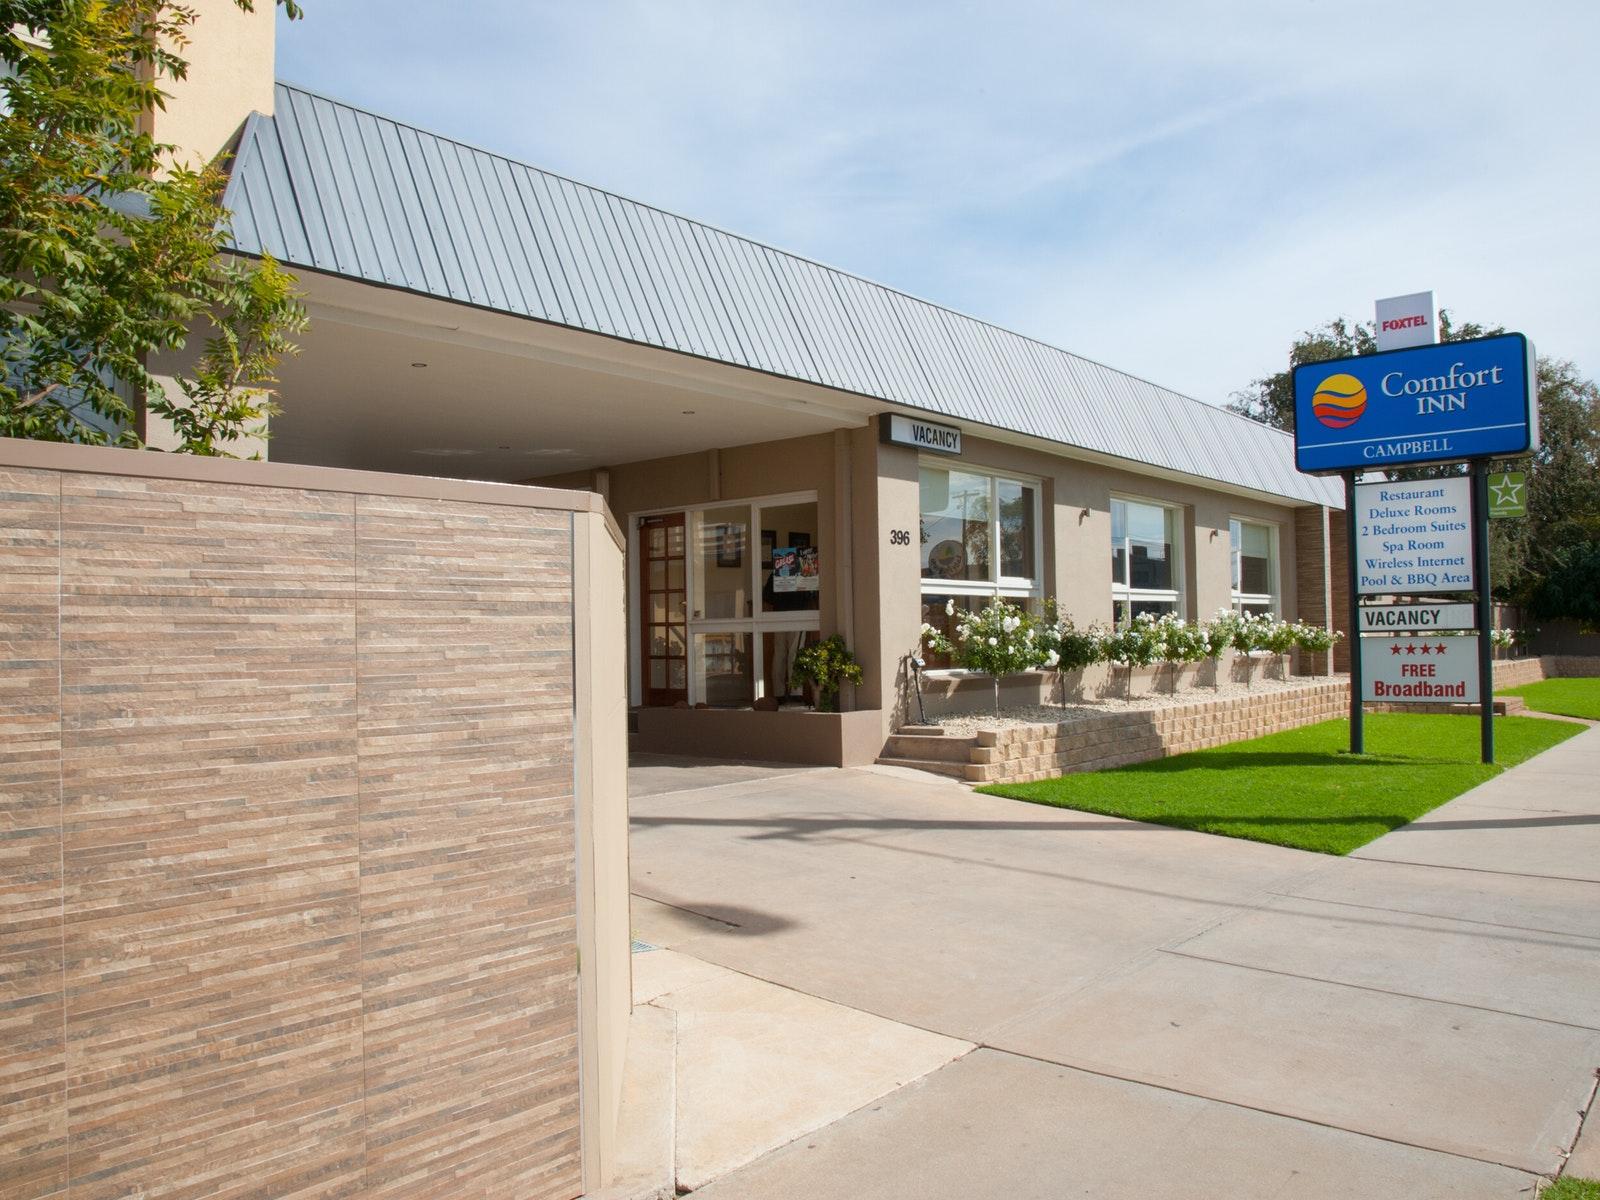 Exterior Photo of motel